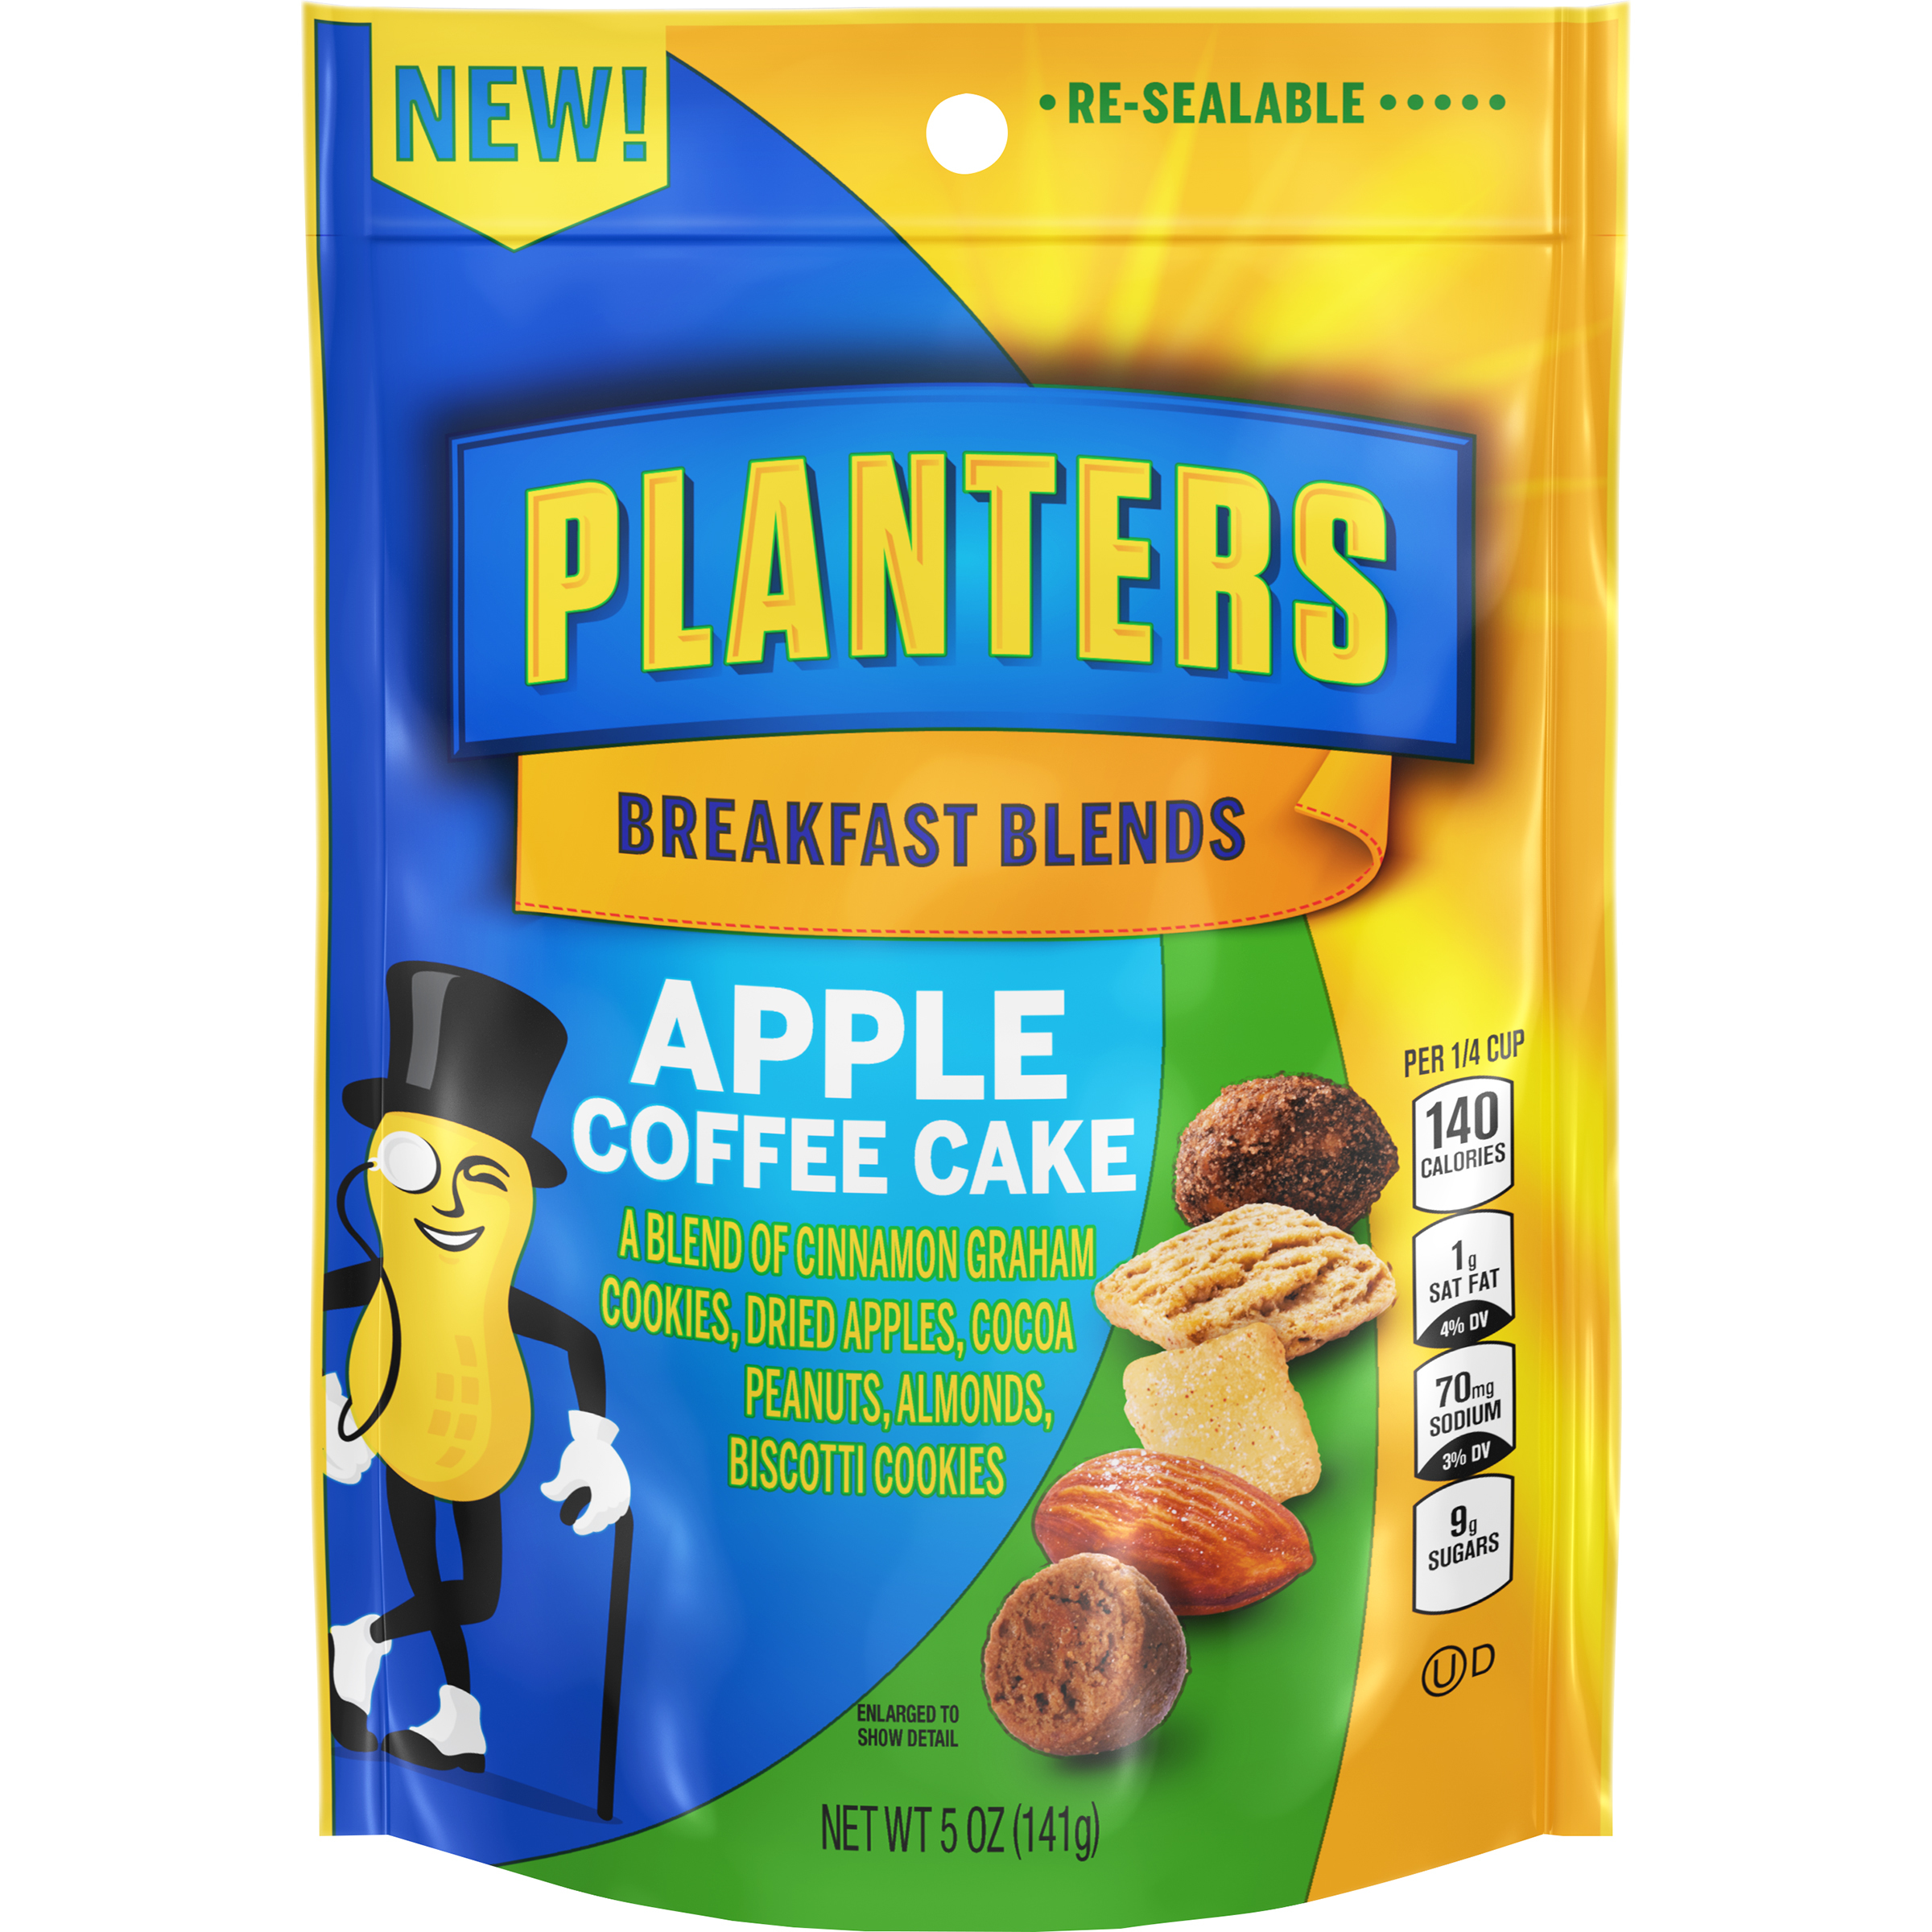 PLANTERS® Breakfast Blends Apple Coffee Cake Trail Mix 5 oz bag